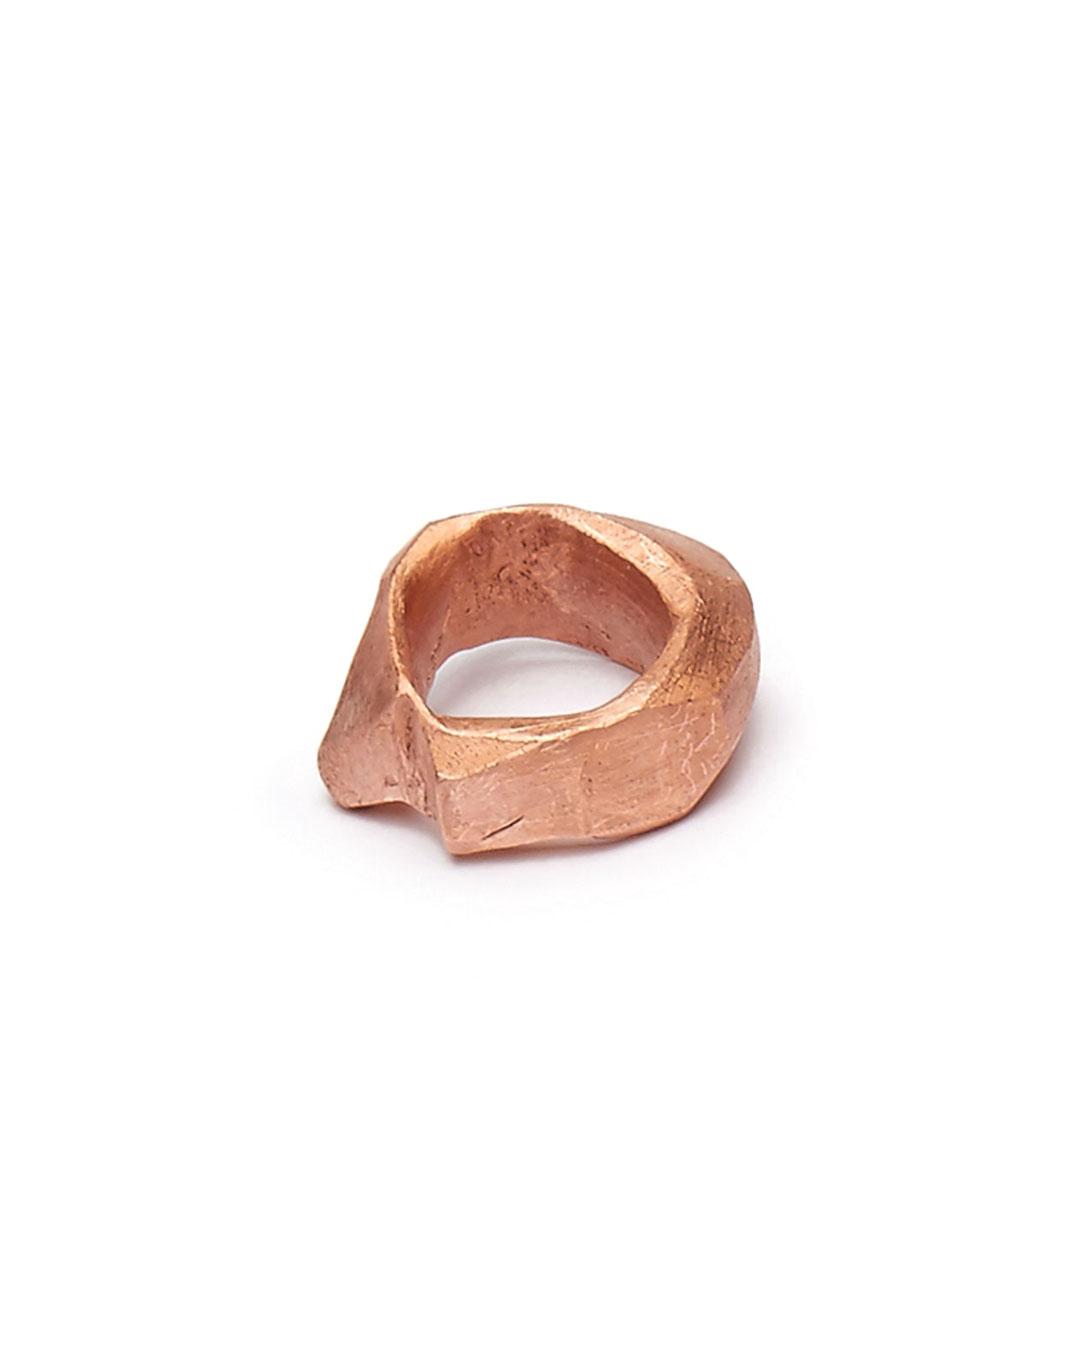 Iris Bodemer, Notizen (Notes), 2016, ring; bronze, 33 x 29 x 15 mm, €500